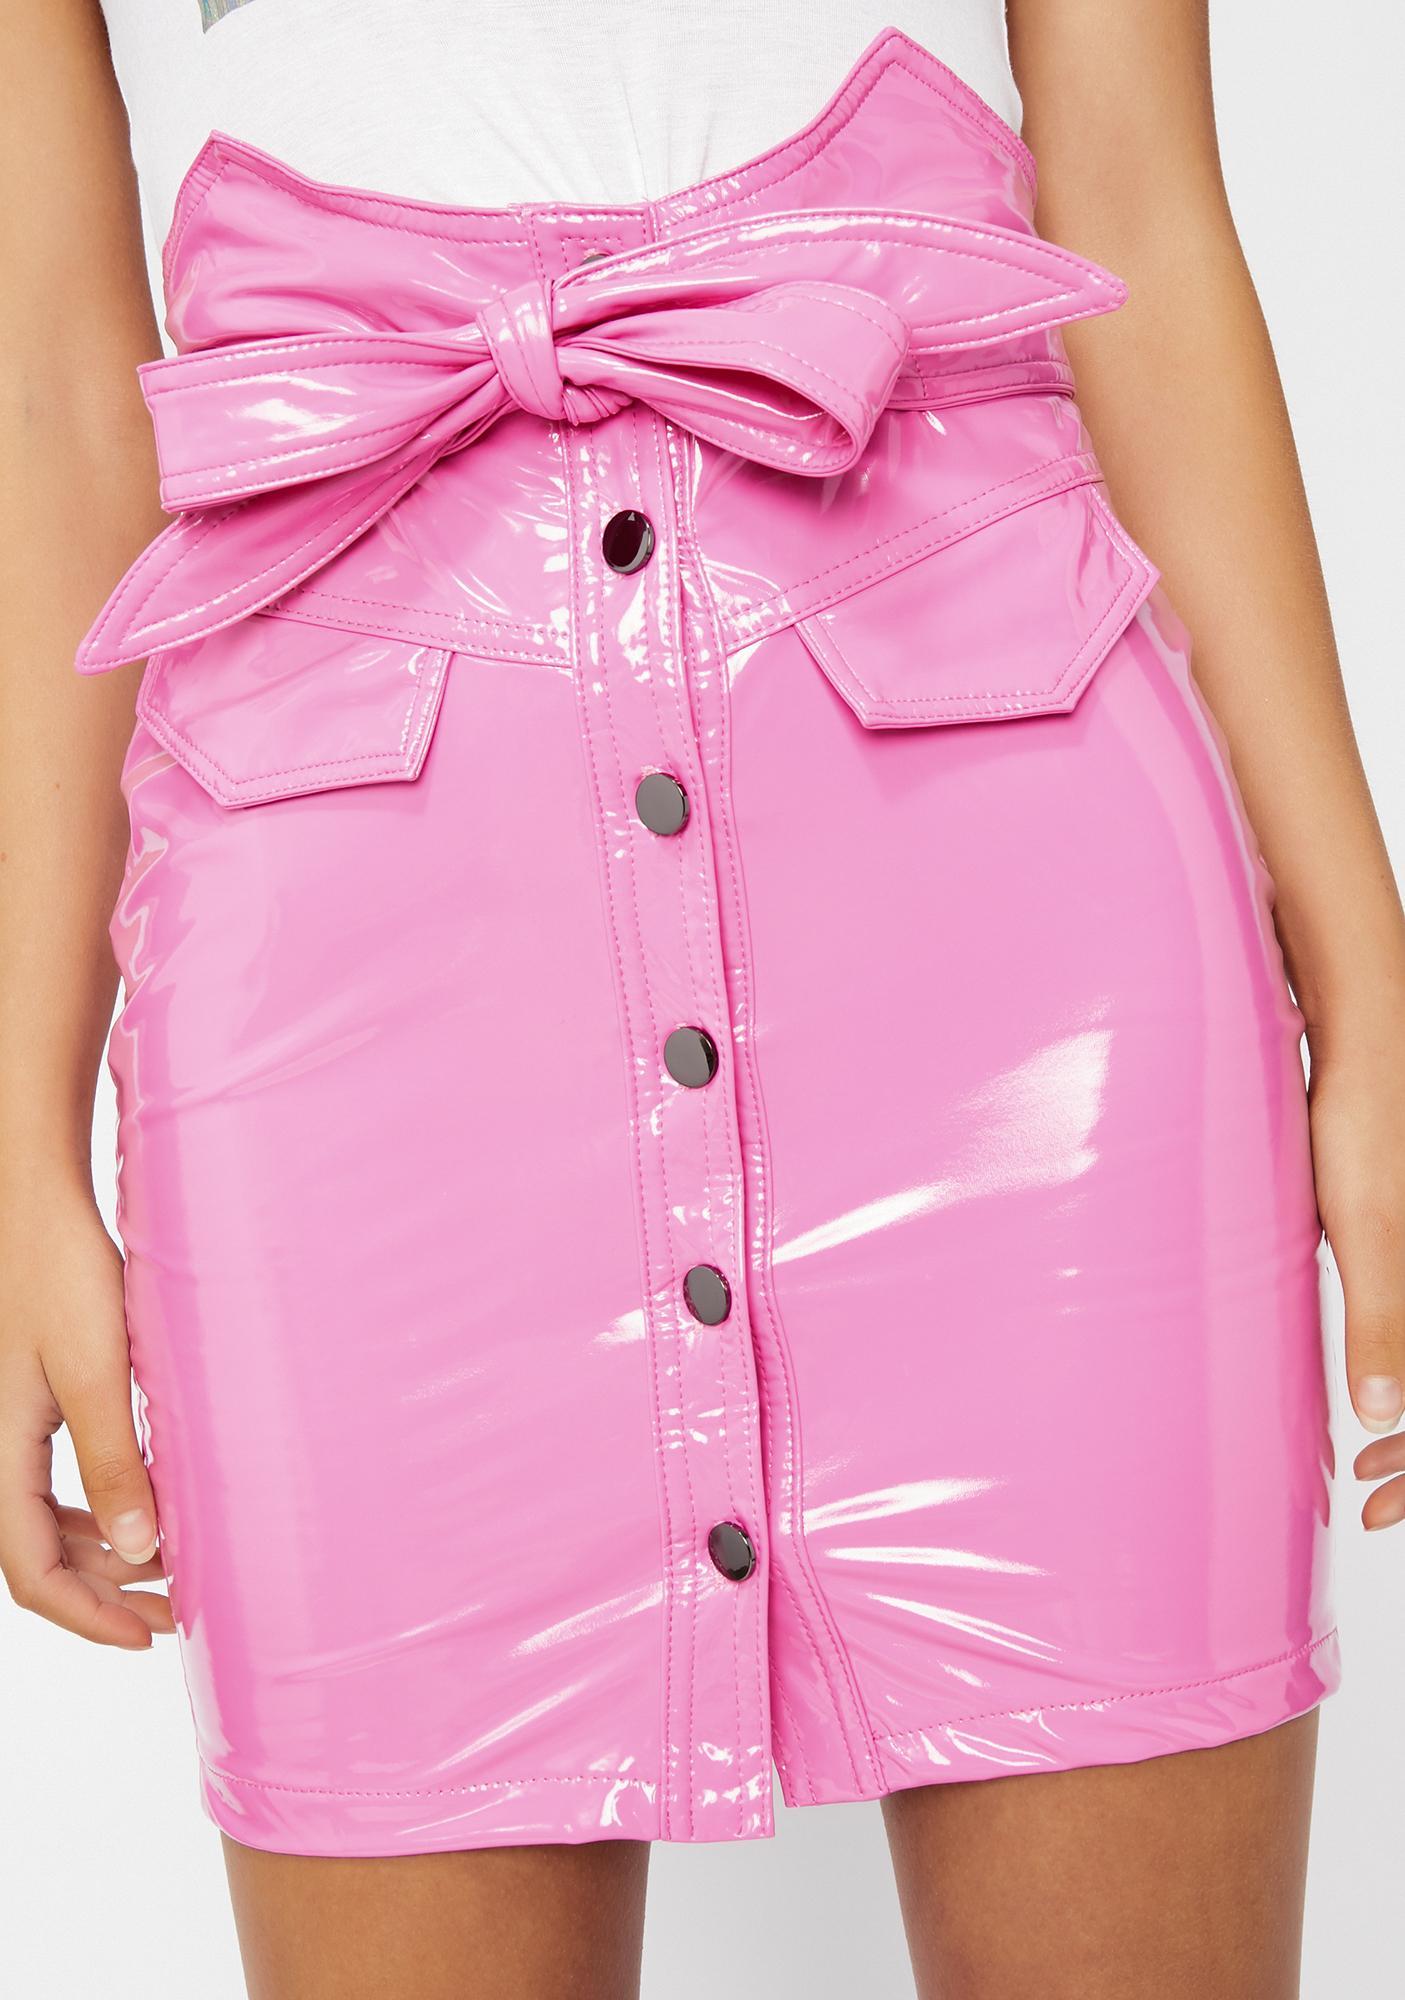 Candy Coated Her Lil Secret Vinyl Skirt